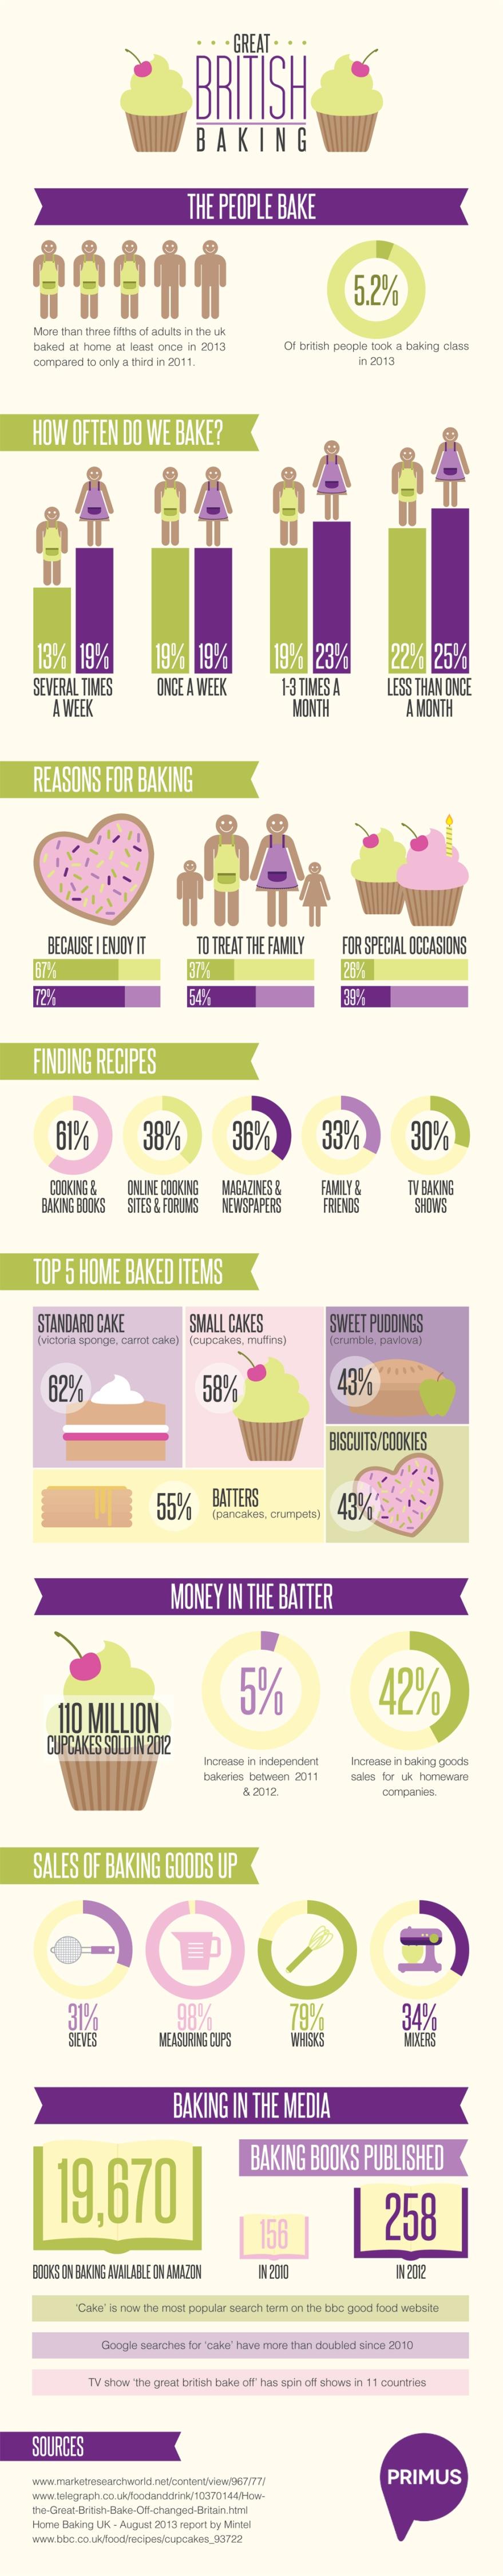 great-british-baking-infographic